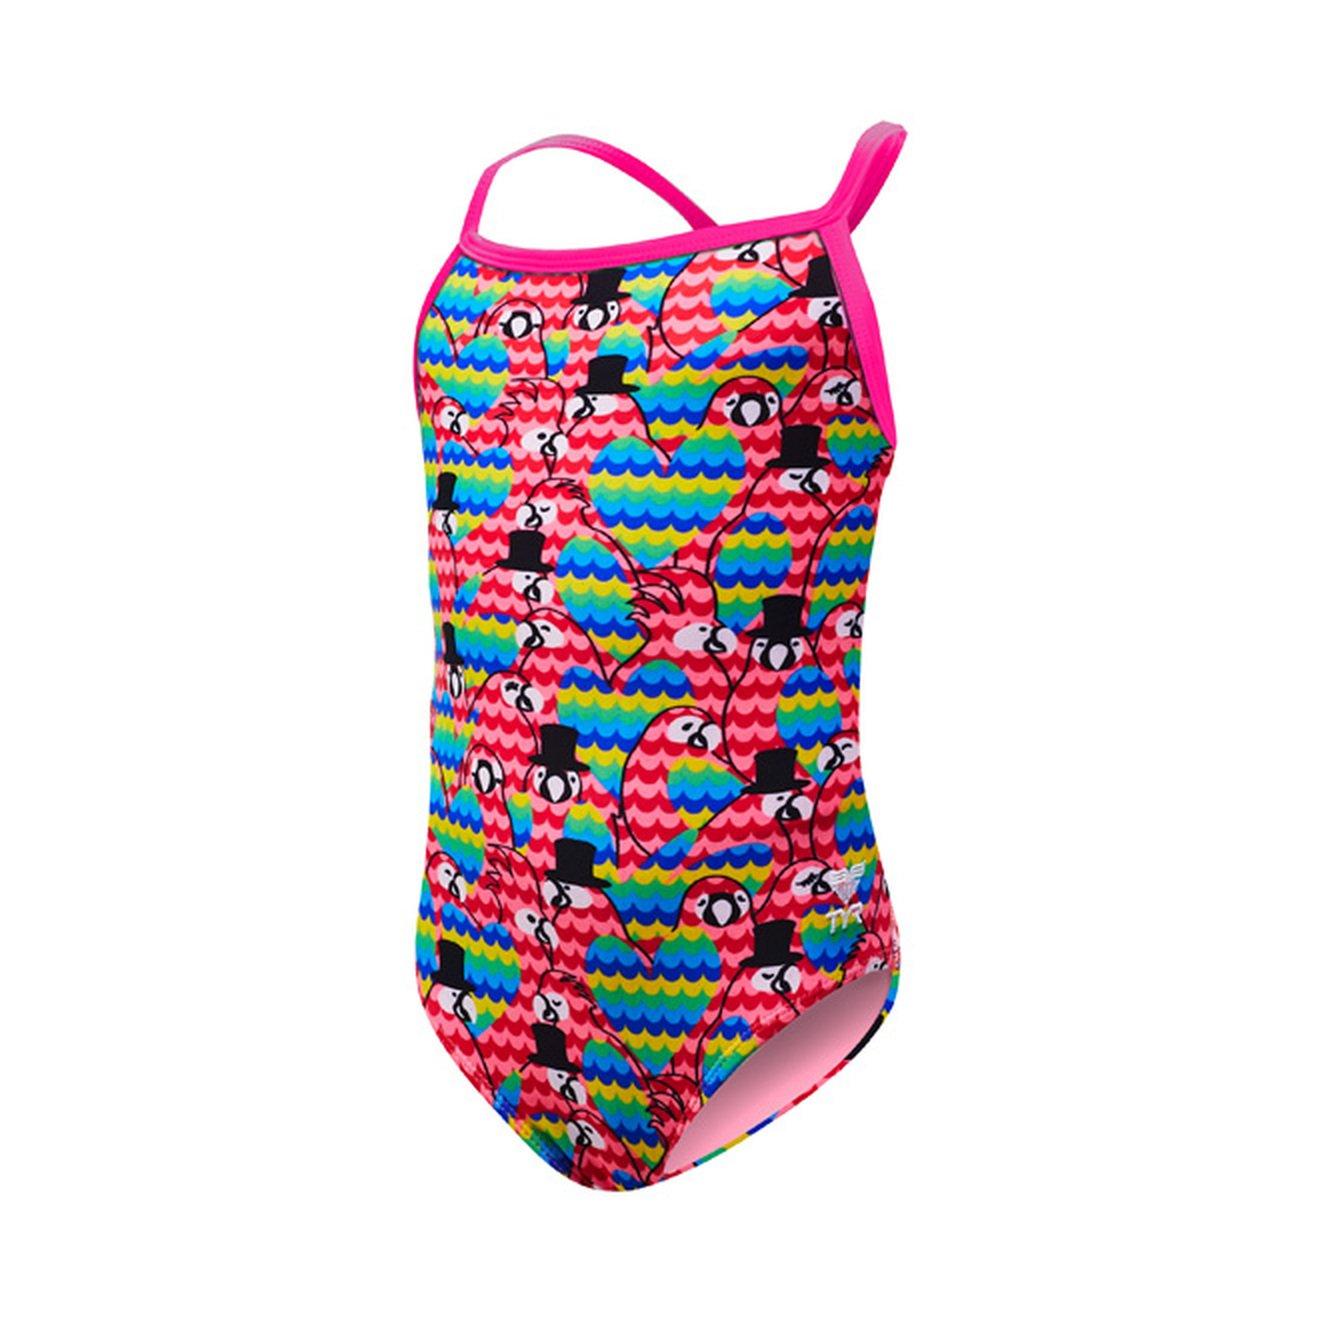 TYR Girls Love Bird Diamondfit Swimming One Piece, Pink Multi, Medium